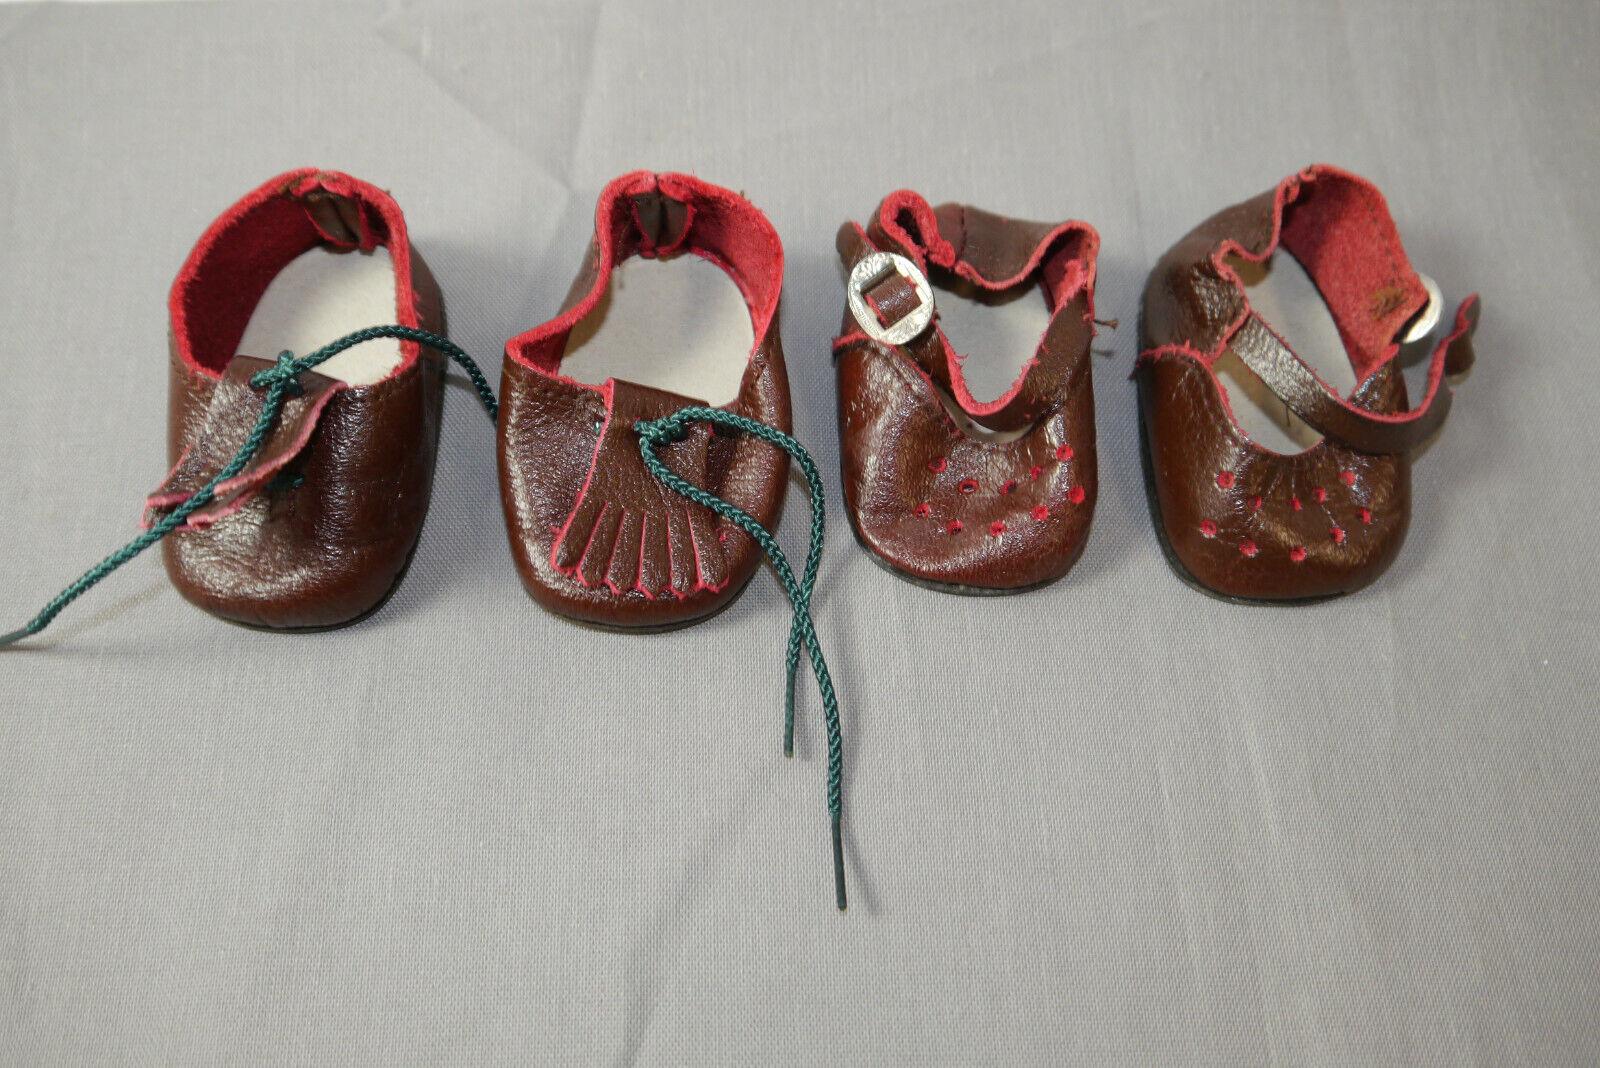 Käthe Kruse original Schuhe 2 Paar braune Leder Schuhe länge 7cm (K24)1